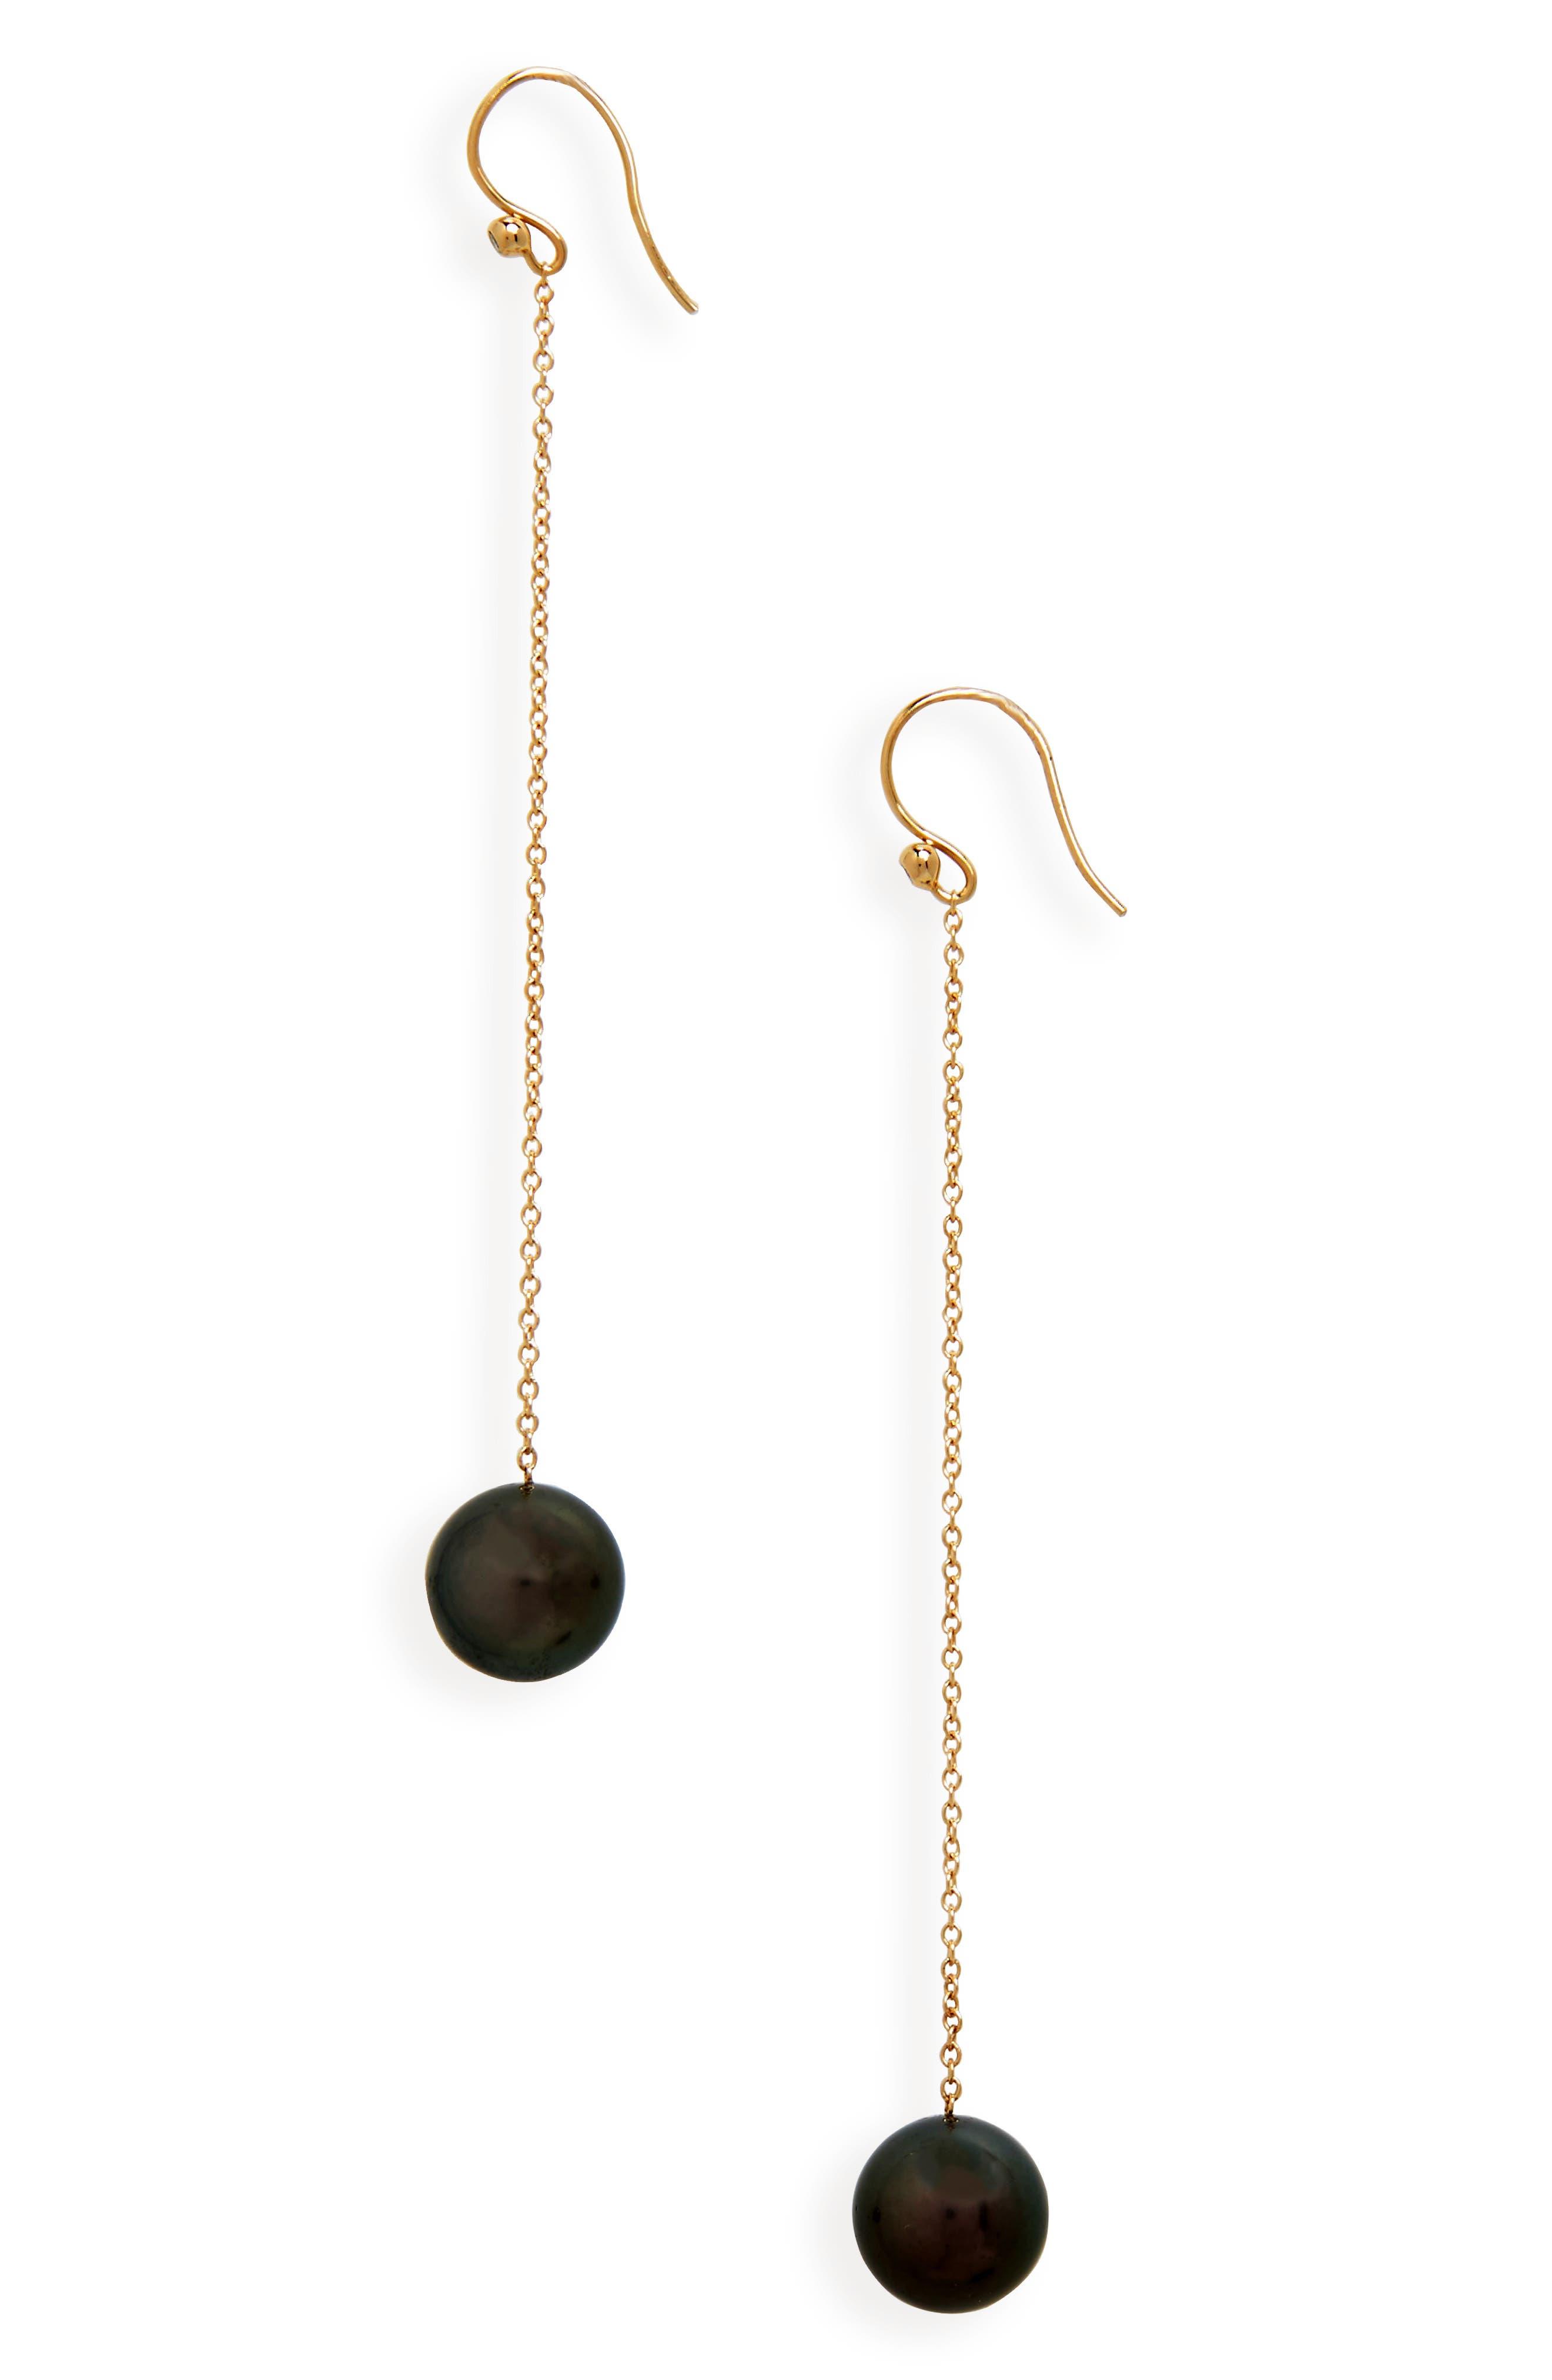 Tahitian Pearl Chain Drop Earrings,                             Main thumbnail 1, color,                             YELLOW GOLD/ BLACK PEARL